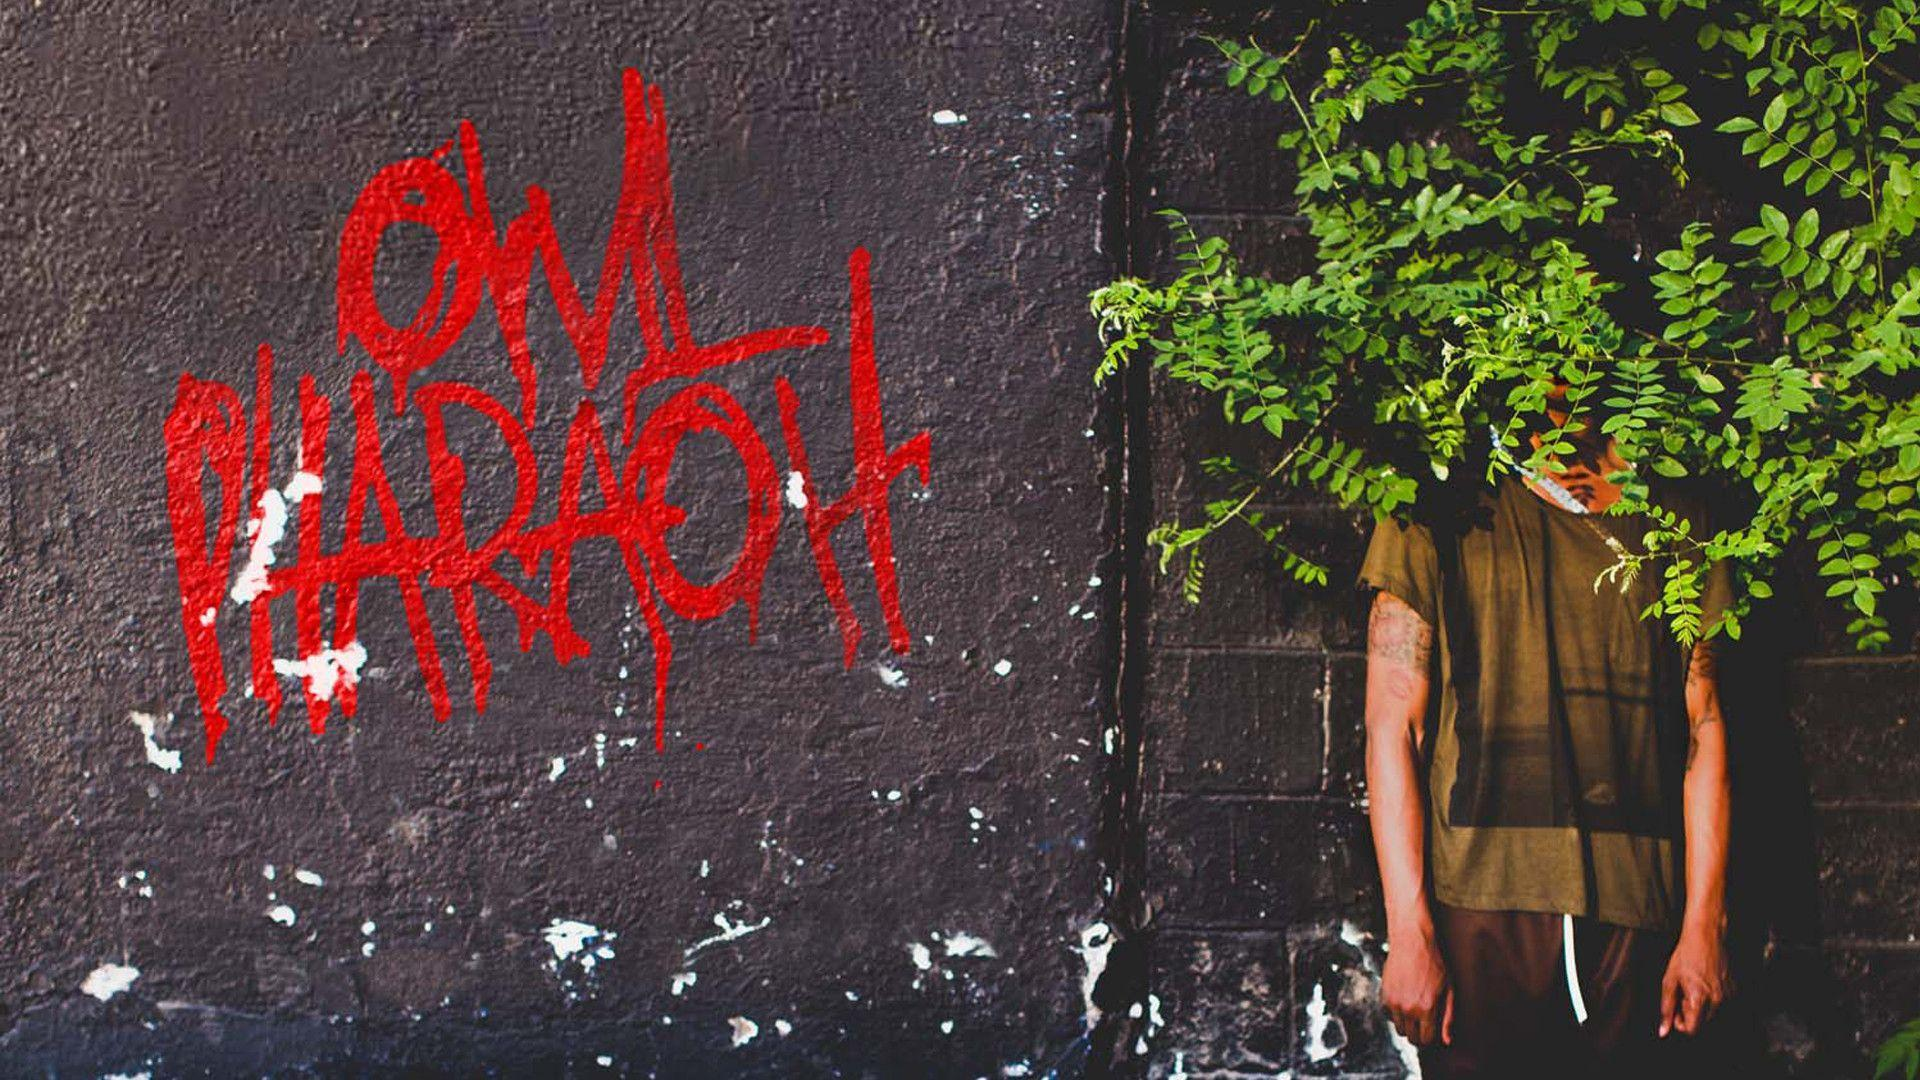 Travis Scott Wallpapers - Wallpaper Cave